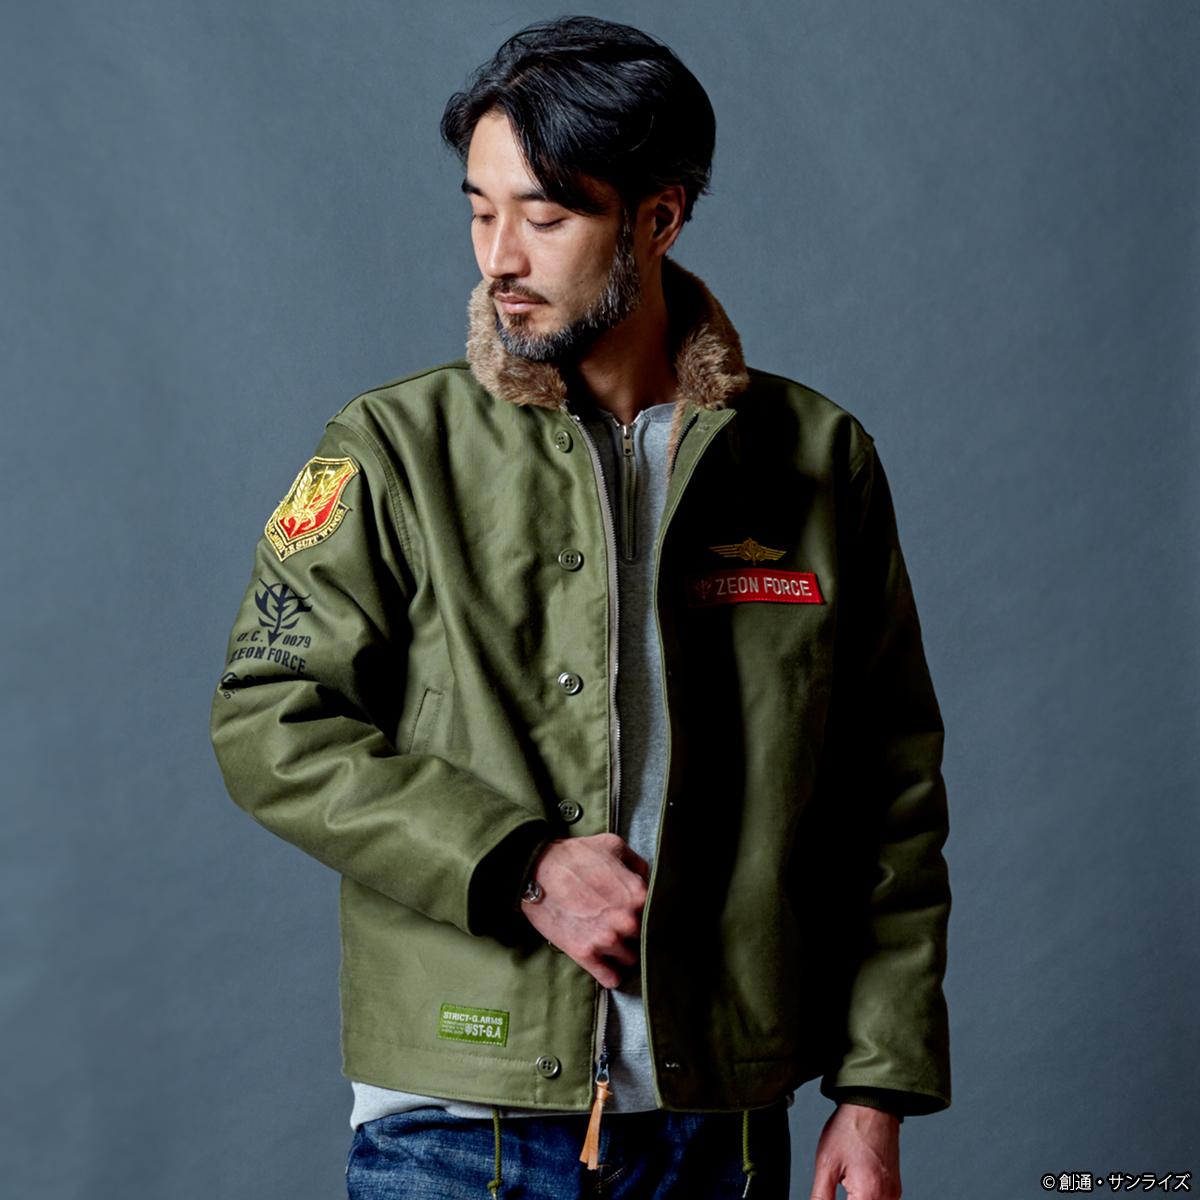 STRICT-G.ARMS『機動戦士ガンダム』N-1 デッキジャケット ジオン軍